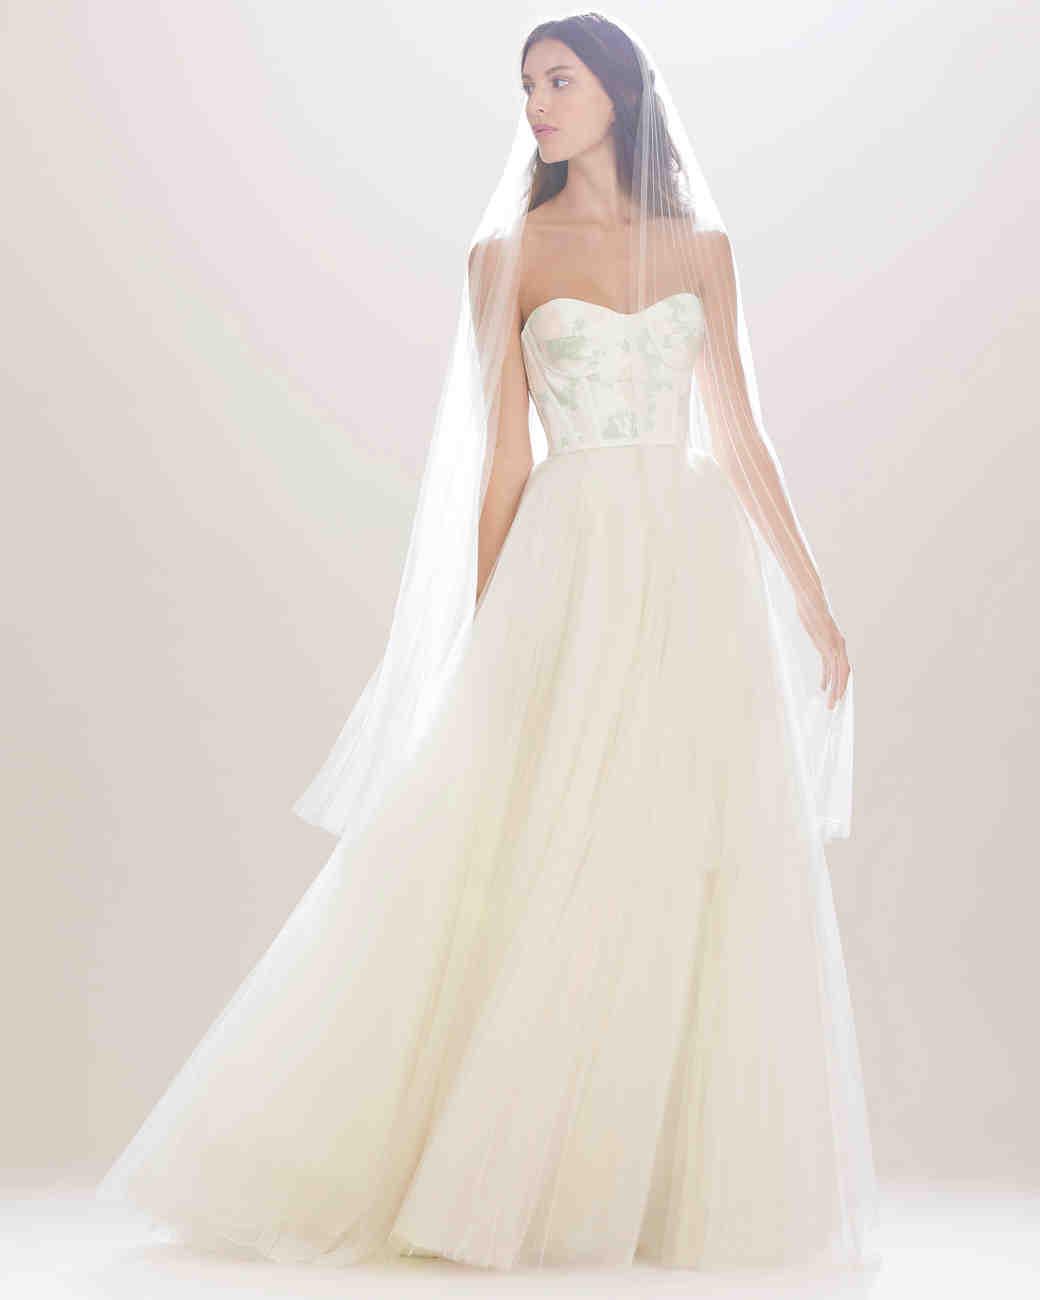 96 Fun Facts About Your Favorite Bridal Designers: Carolina Herrera Fall 2016 Wedding Dress Collection